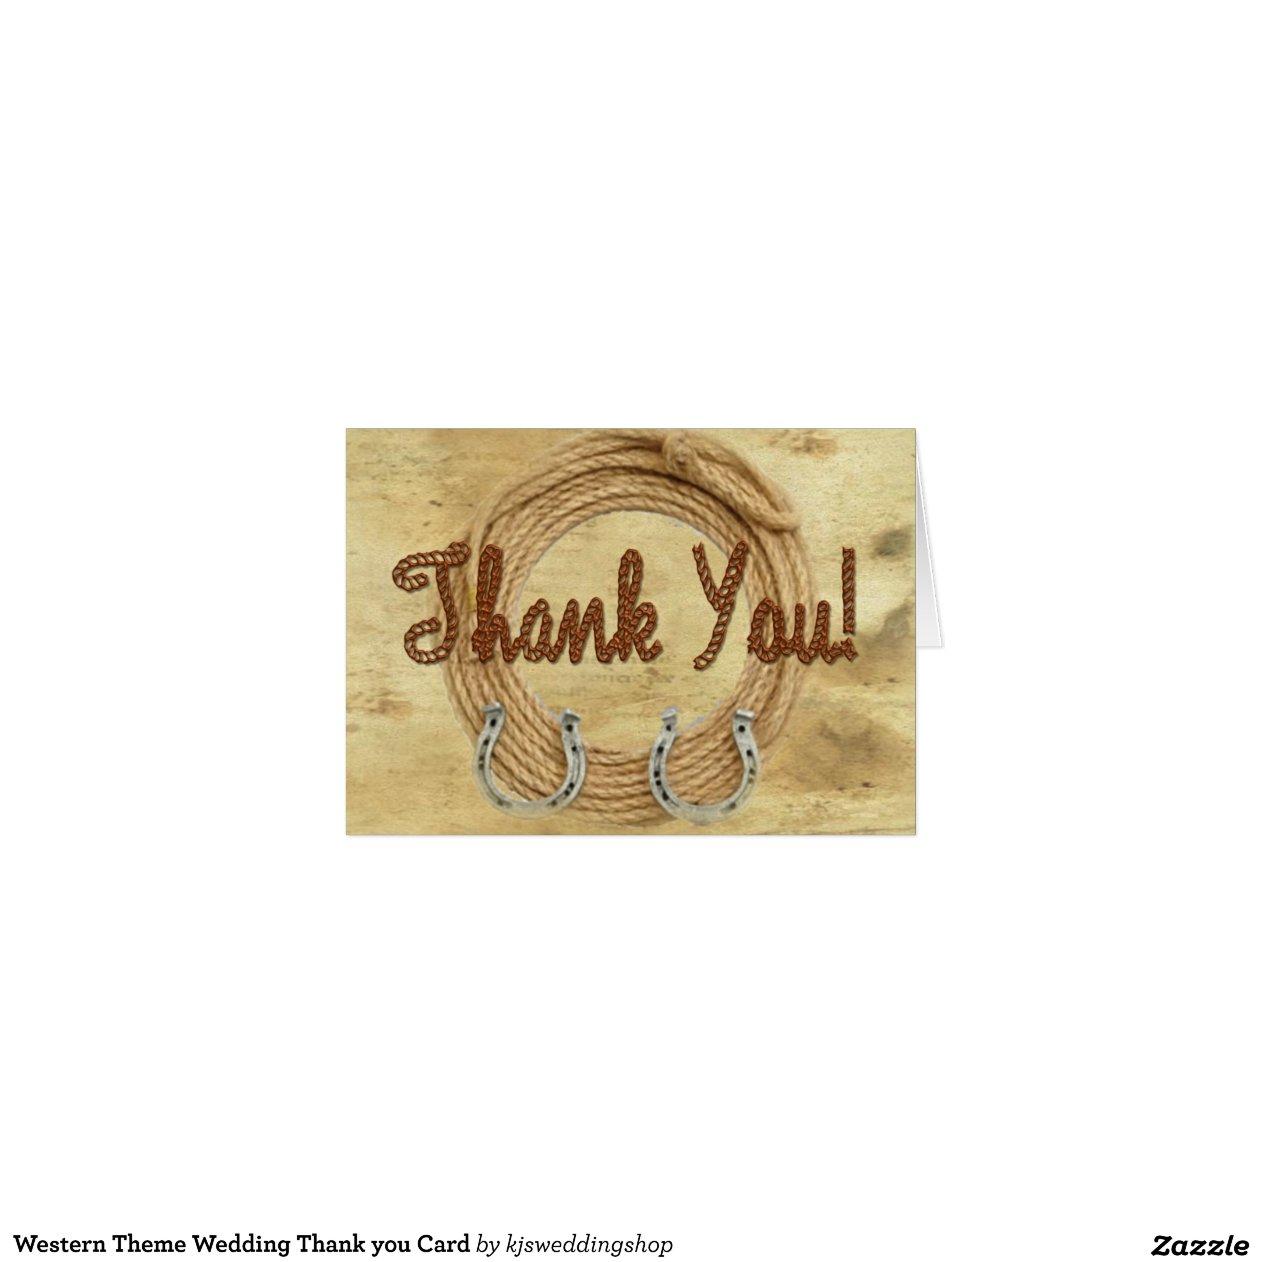 No Thank You For Wedding Gift: Western Theme Wedding Thank You Card